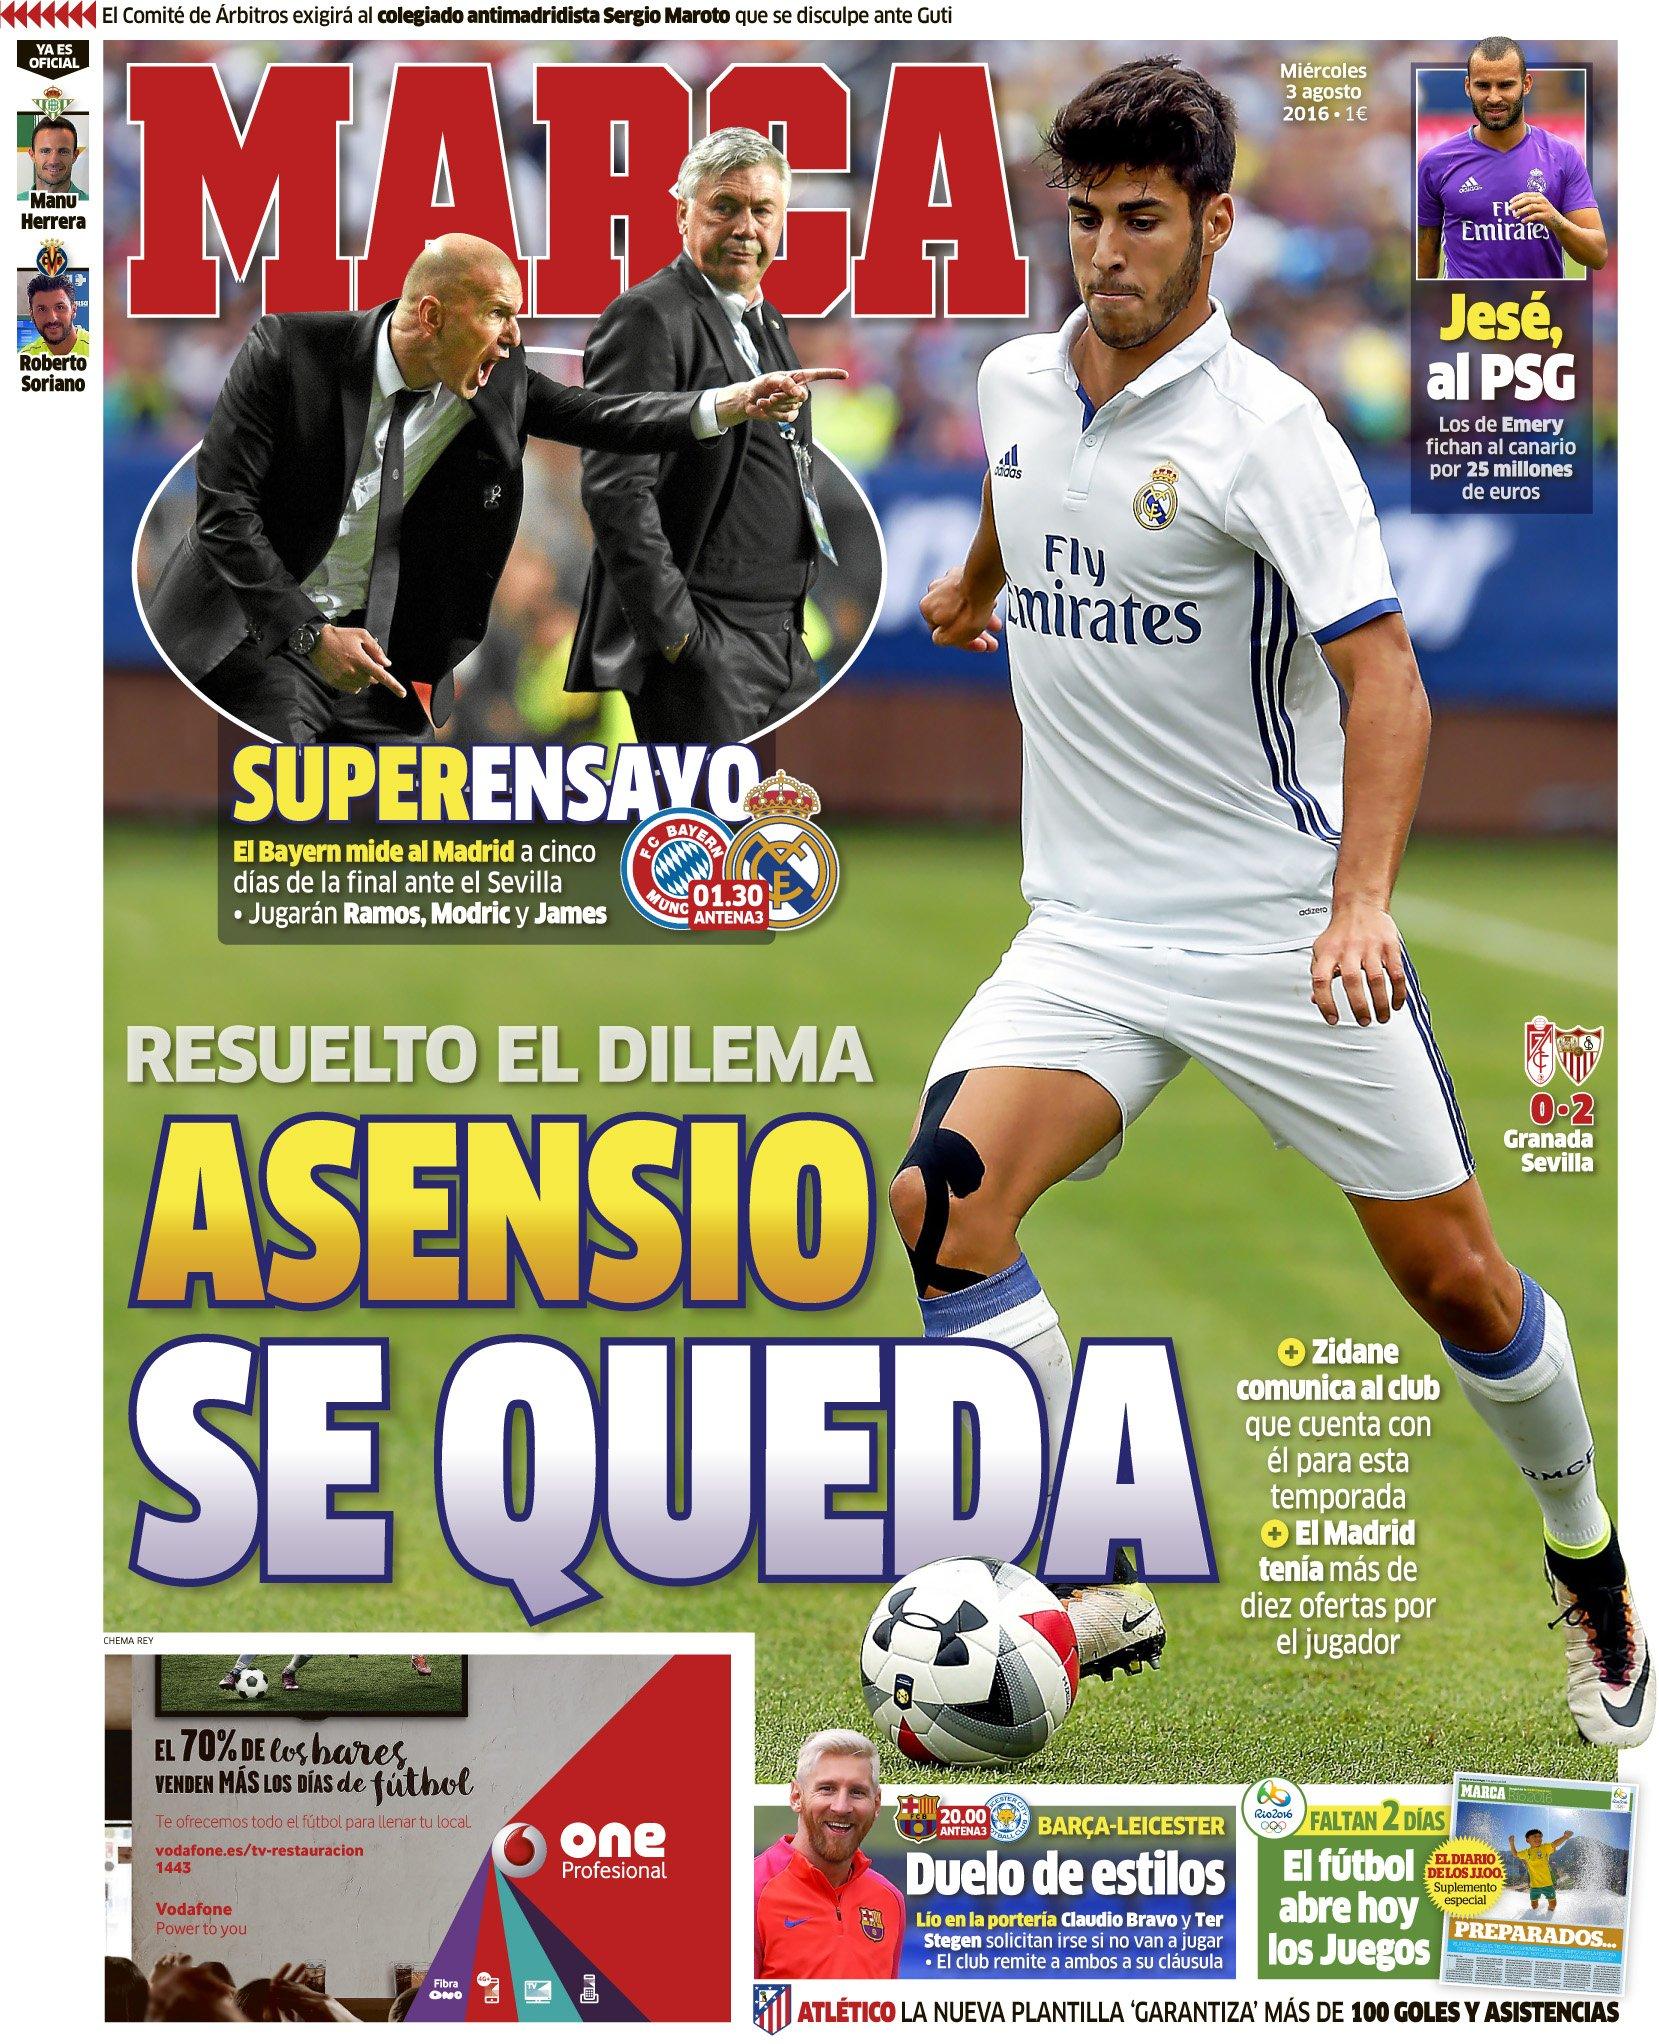 #LaPortada 'Asensio se queda' https://t.co/vDroNqkU4s